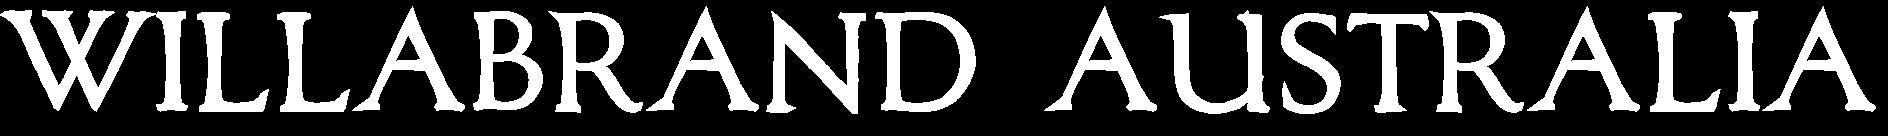 Willabrand Australia Wordmark